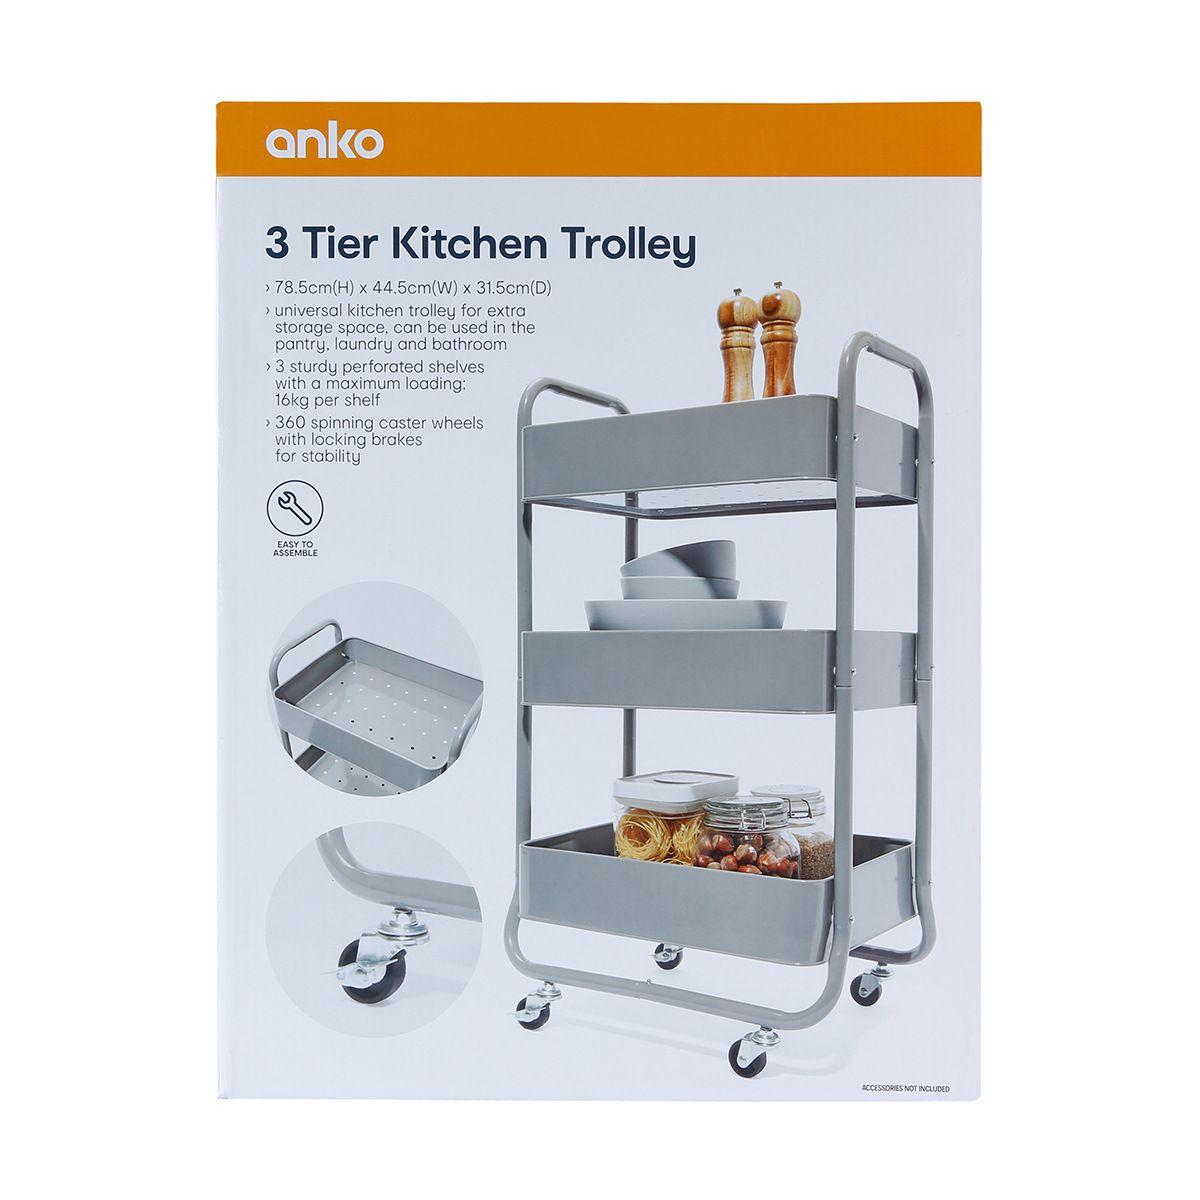 Craft Room Organization Ideas 16 Ways To Store Supplies Kitchen Trolley Kitchen Craft Room Organization